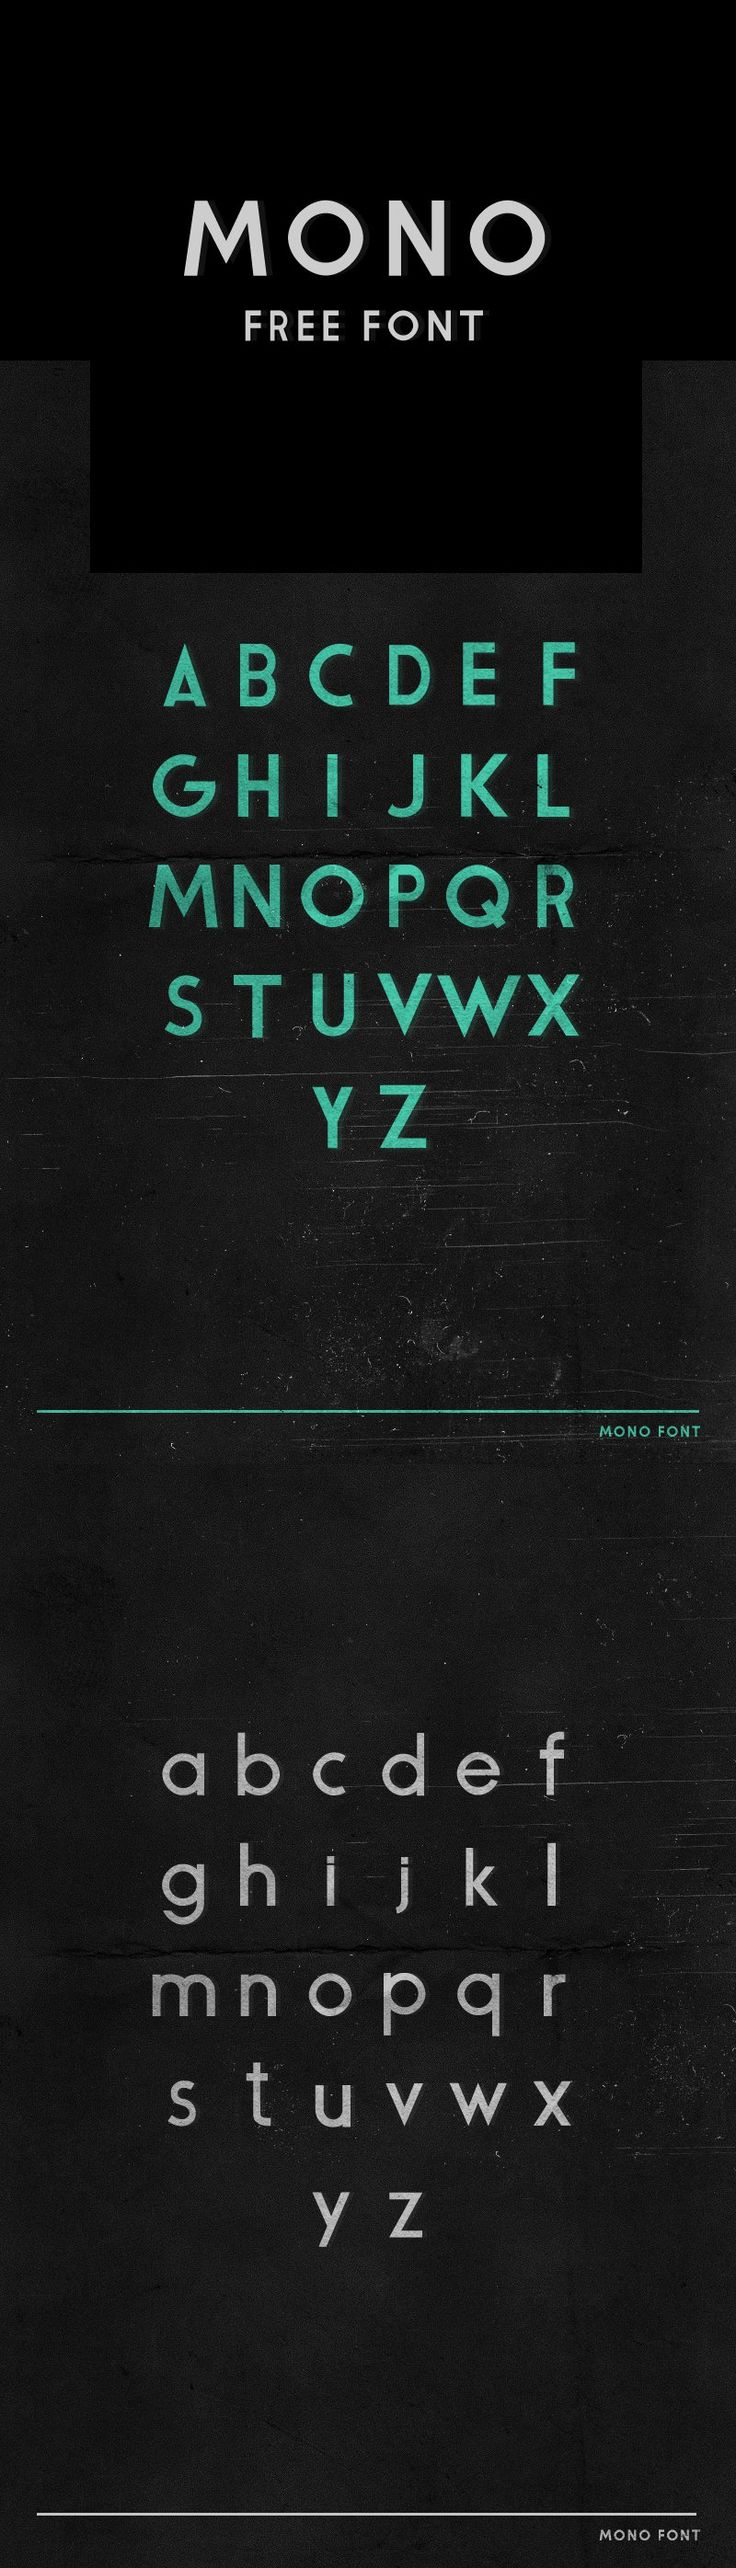 Best Free Fonts For Web Design # 76